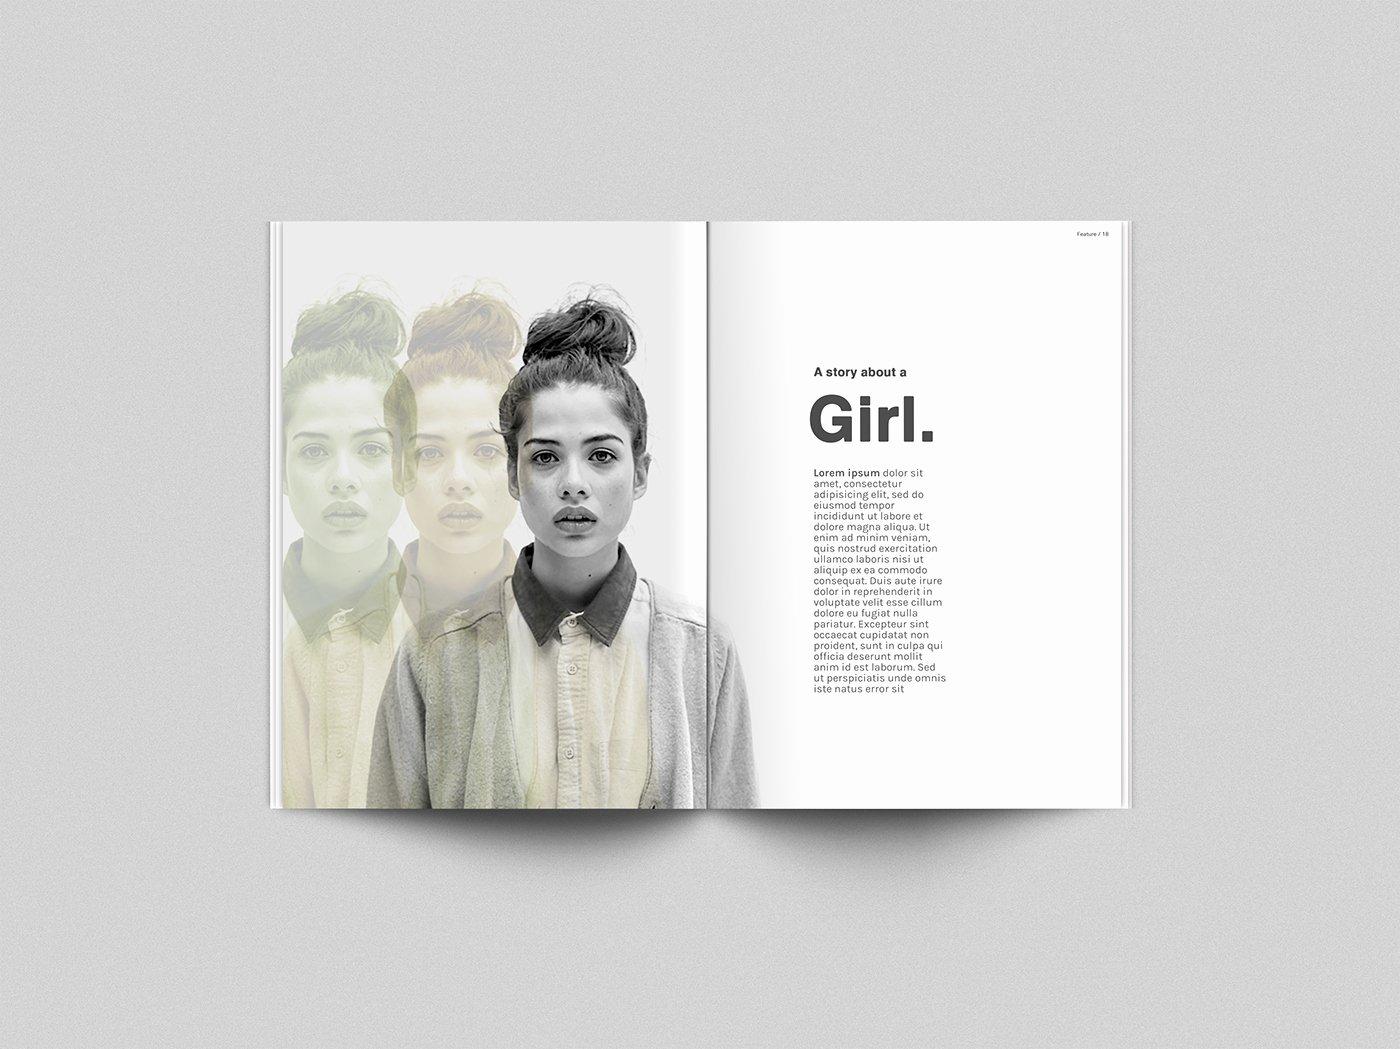 Magazine Ad Template Free Elegant Free Download Magazine Mockup Template